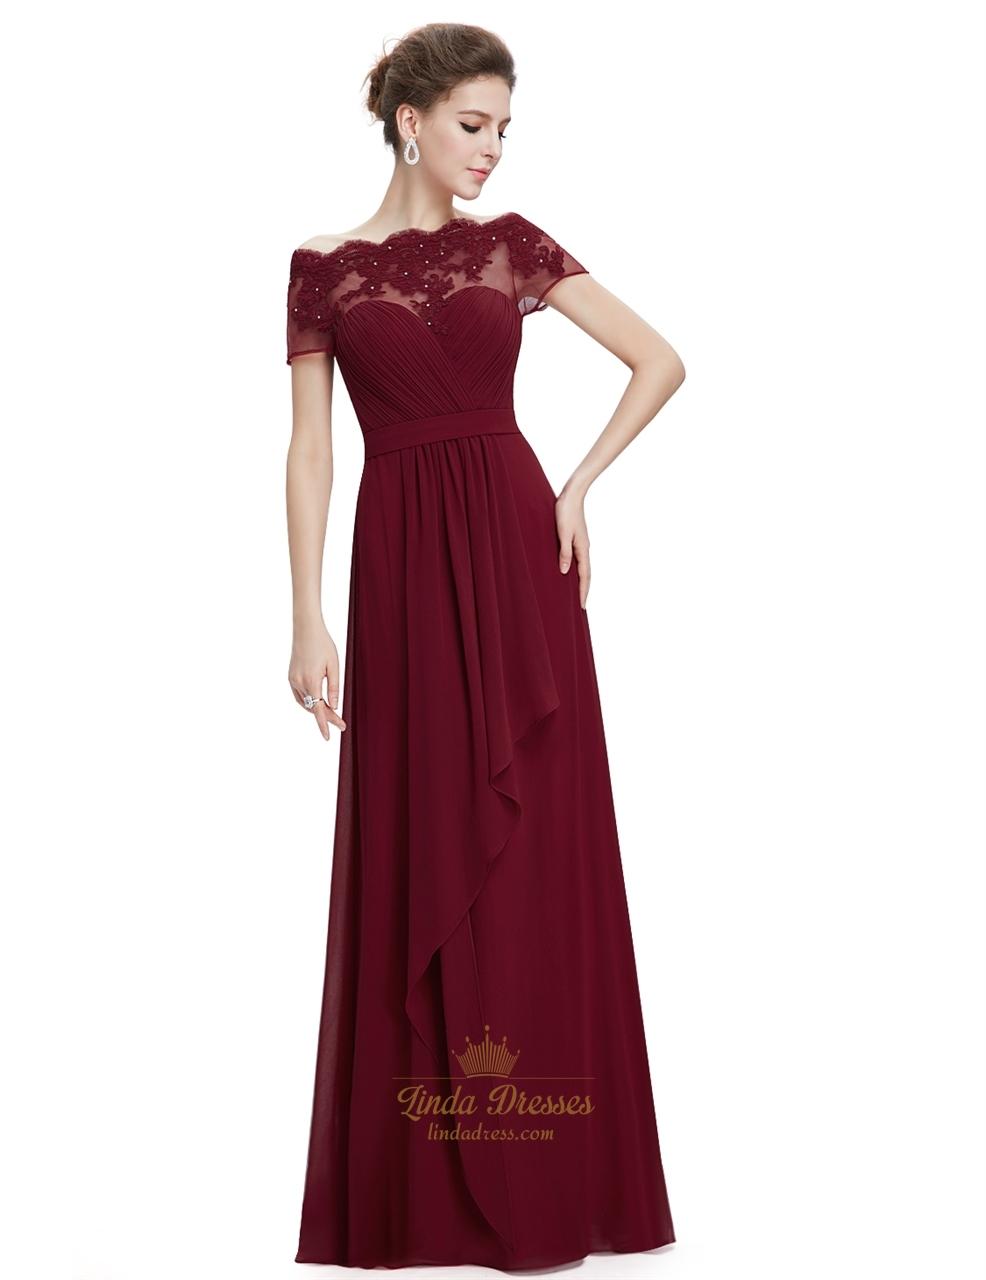 burgundy sweetheart chiffon lace overlay top formal dress. Black Bedroom Furniture Sets. Home Design Ideas